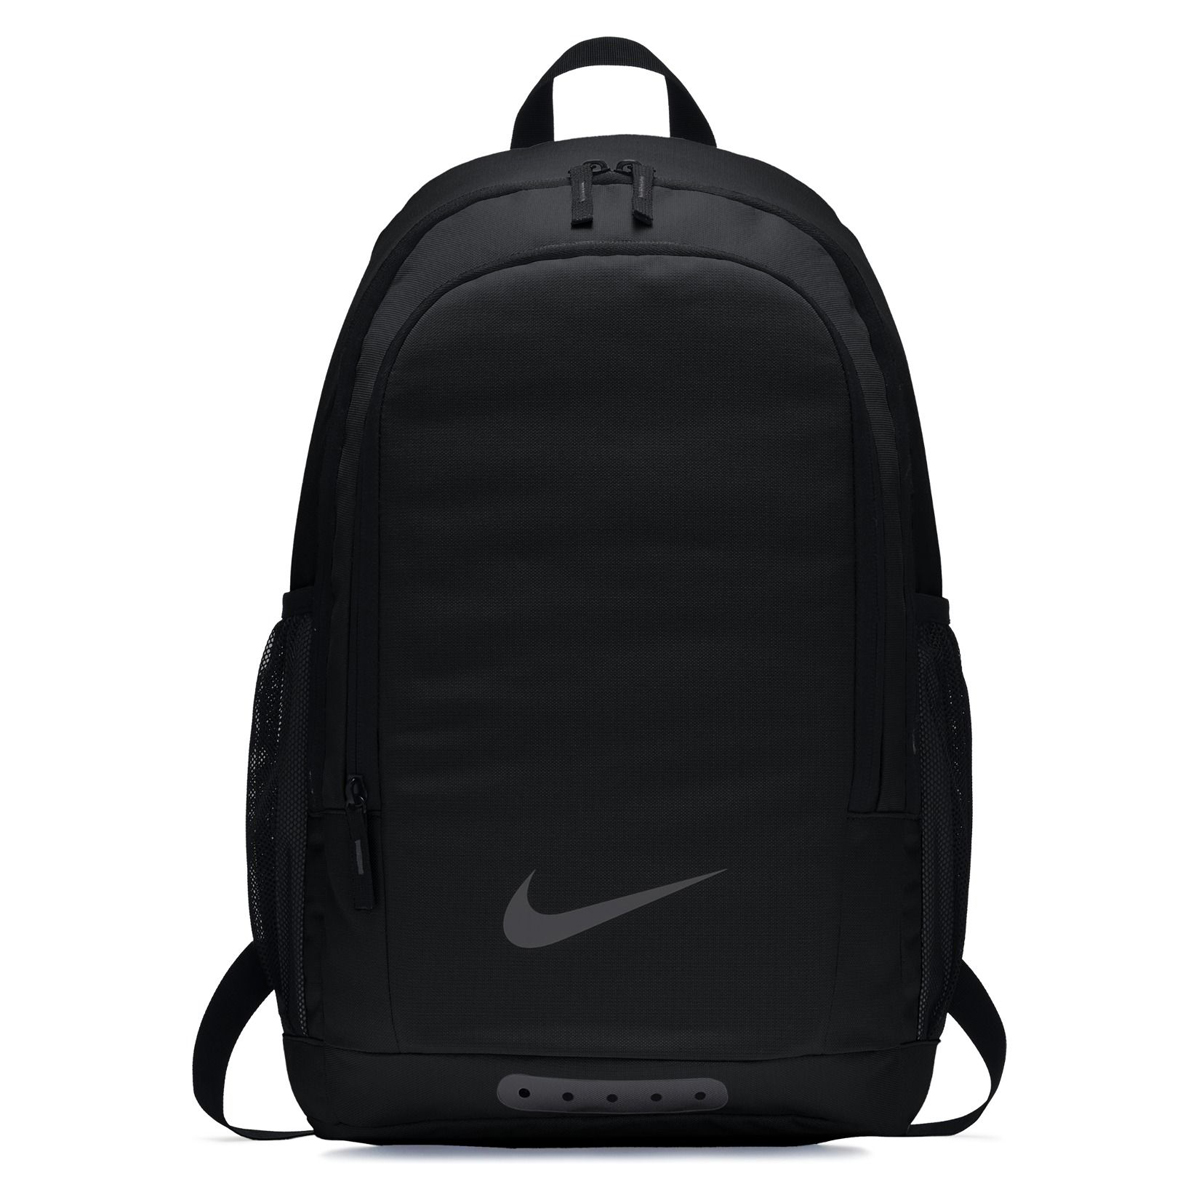 50c752f60b NIKE NIKE ruksak NK ACDMY BA5427-010 - Jeftinije.hr